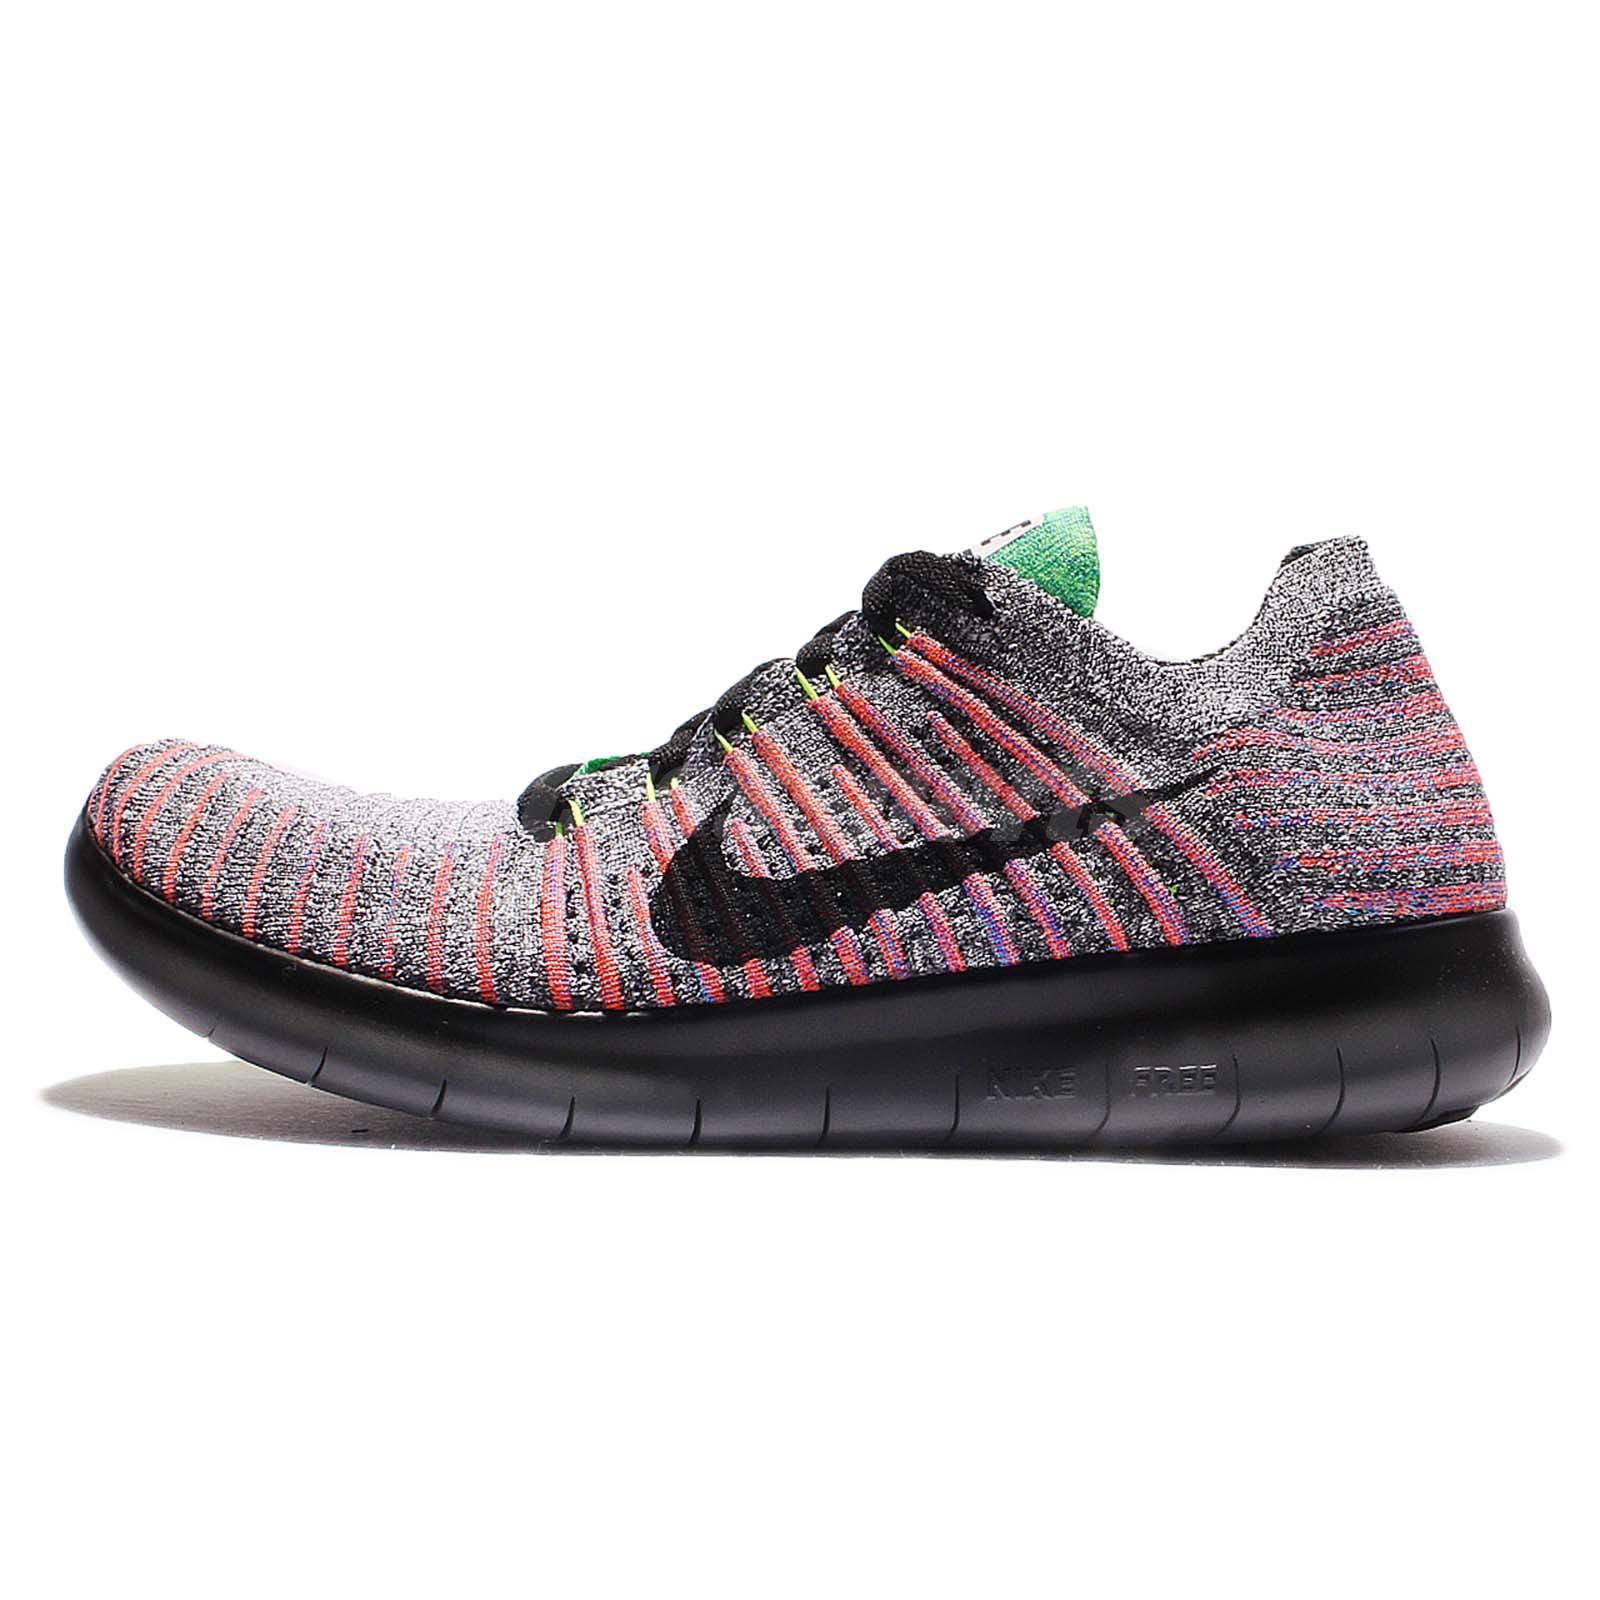 Nike Free RN Flyknit Run Multi-Color Black Men Running Shoes Sneakers  831069-108 ...